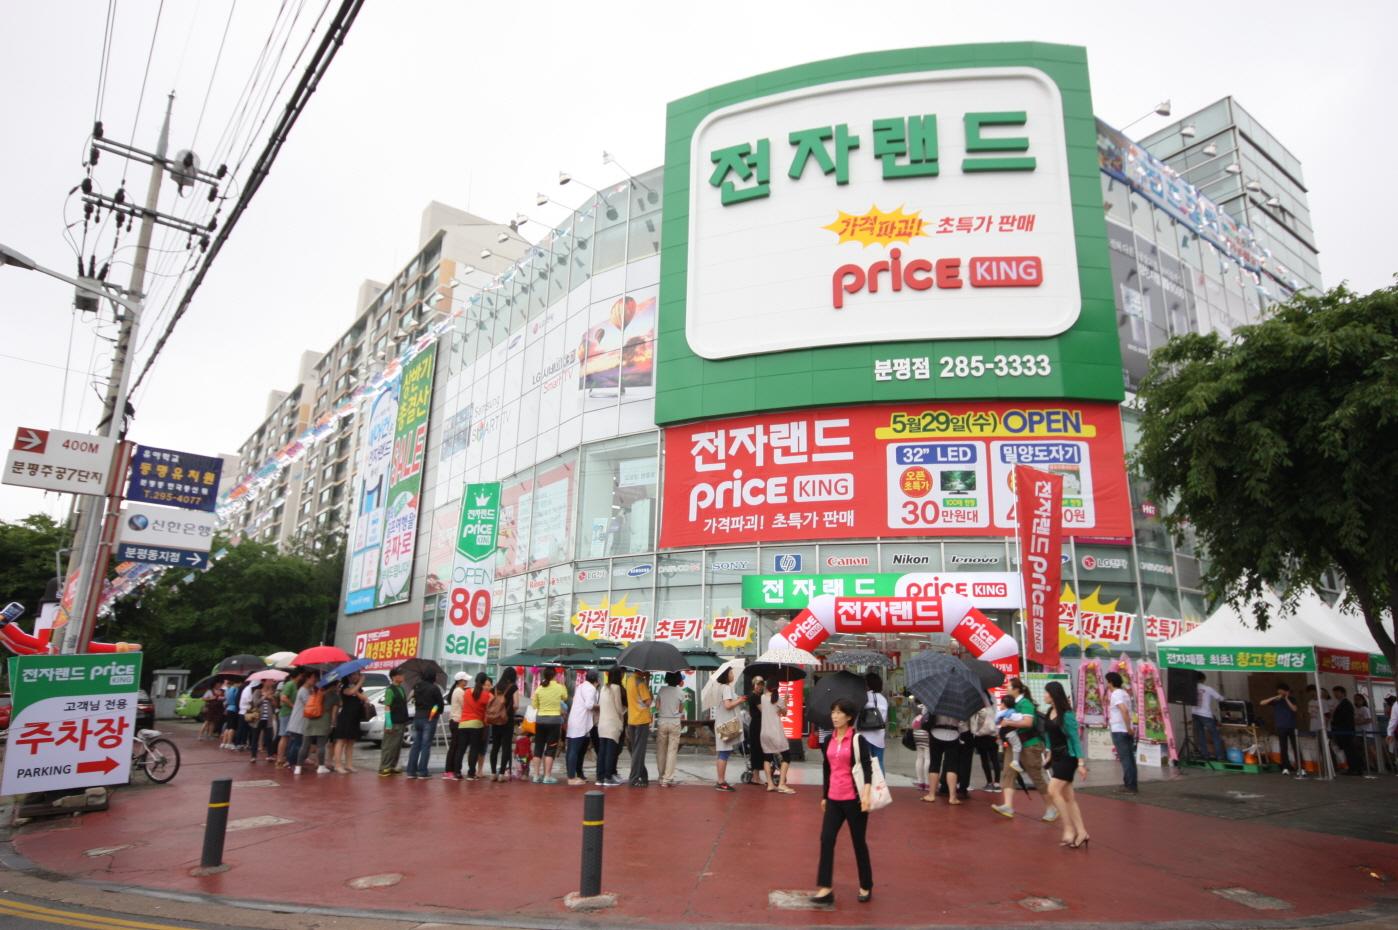 ET Land Price King – Bunpyeong Branch (전자랜드 프라이스킹 (분평점))